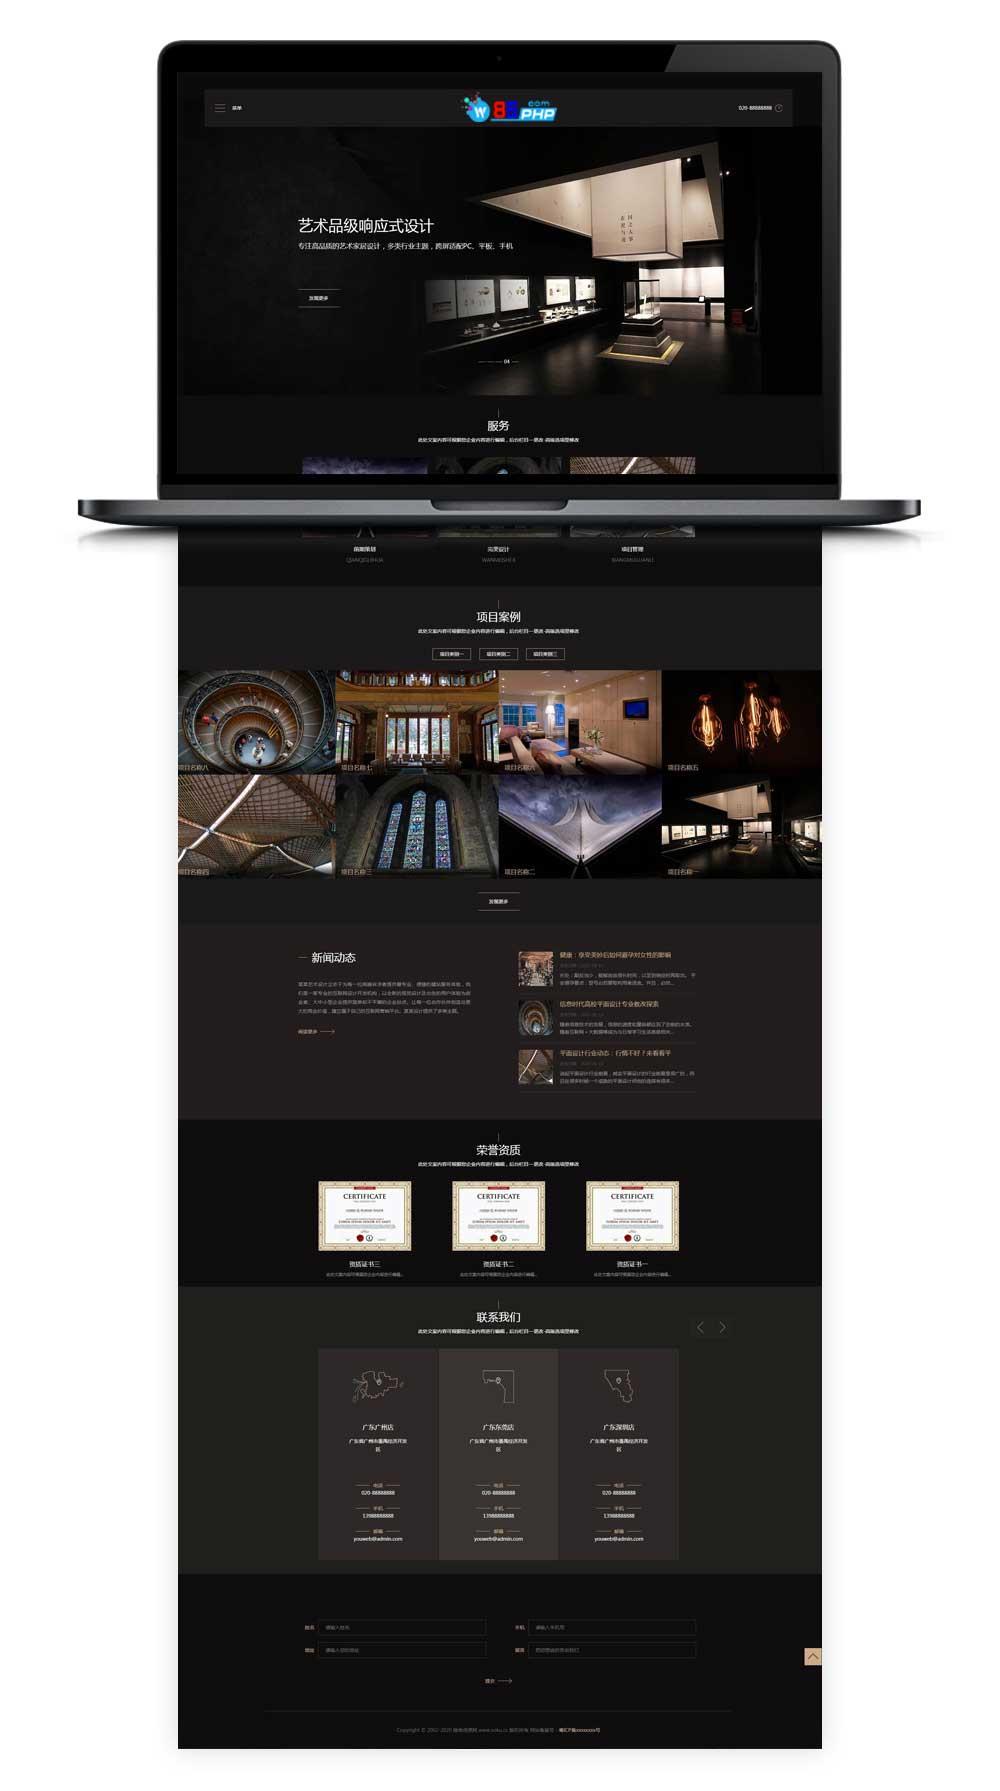 D94【织梦dedecms】HTML5响应式家装设计网站模板家装装修模板源码[含手机版移动端数据]